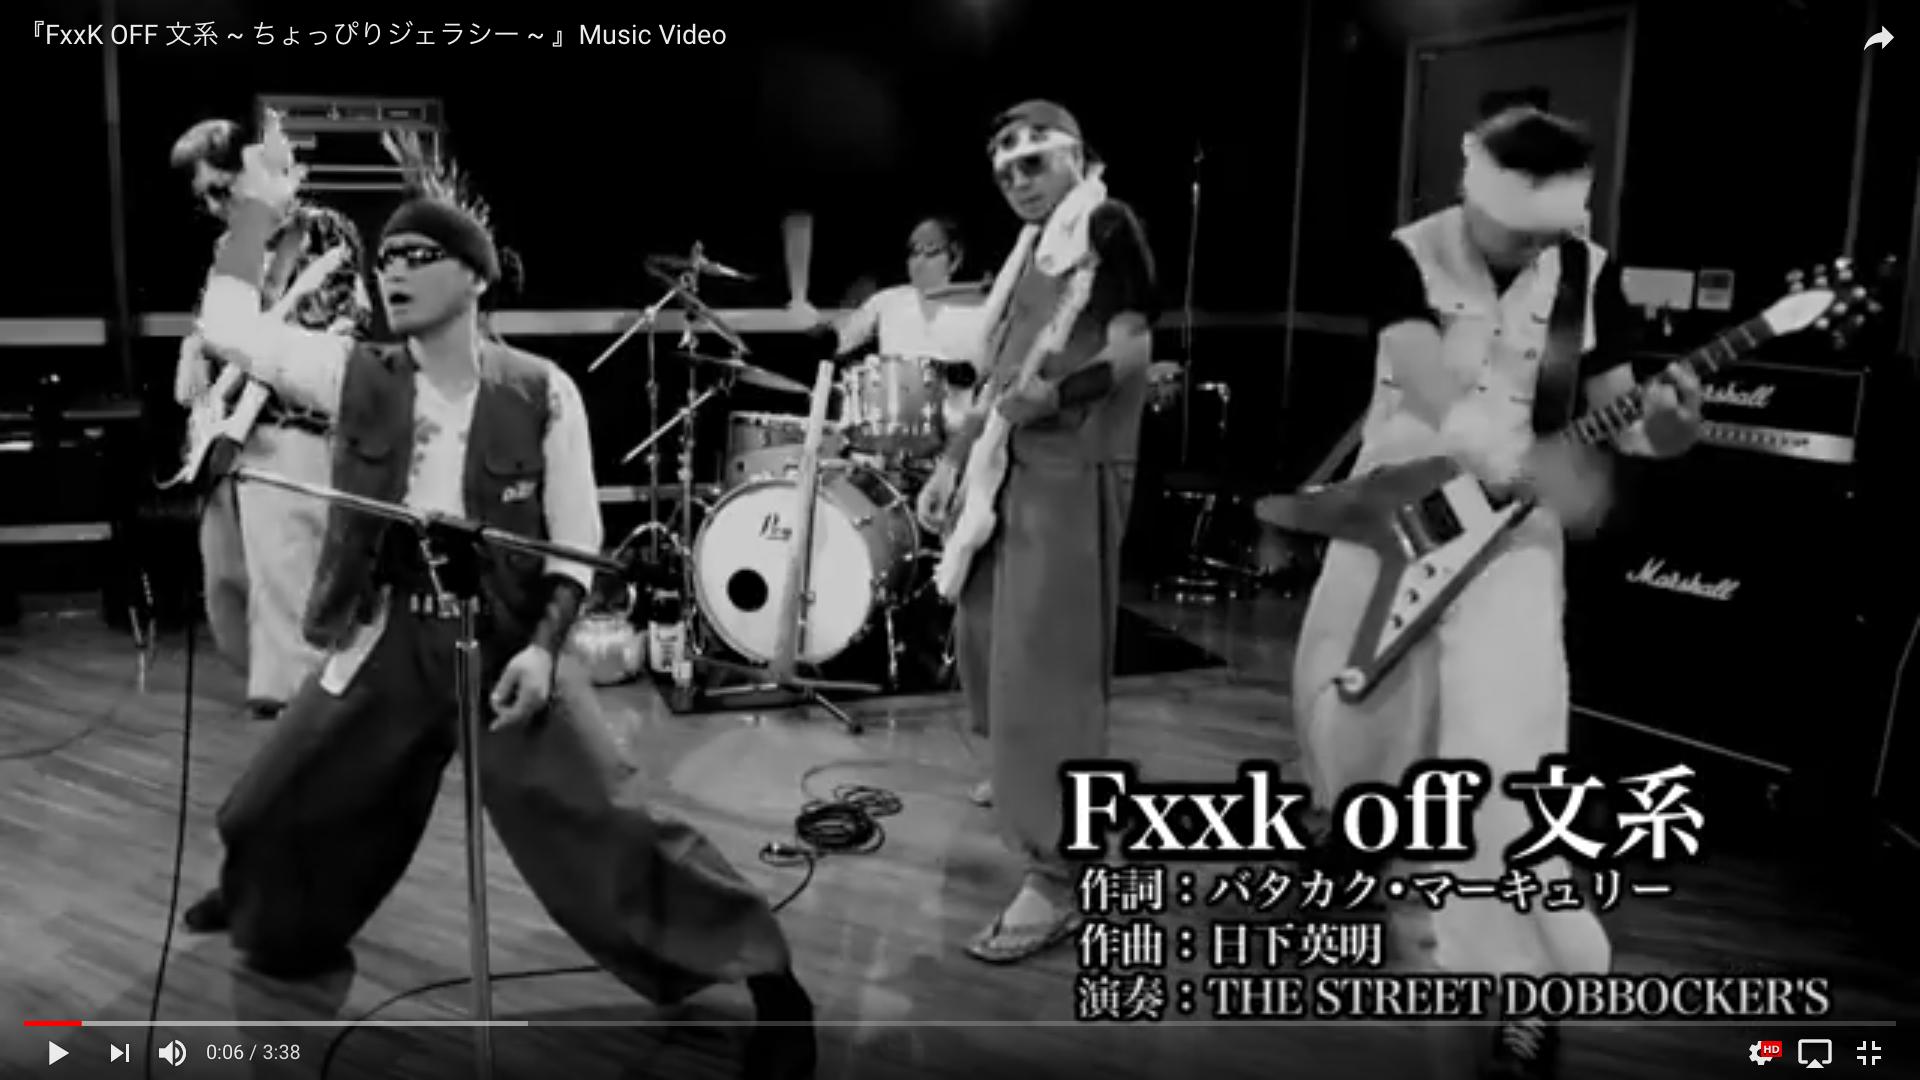 Music Video「FxxK OFF 文系 ~ちょっぴりジェラシー~」